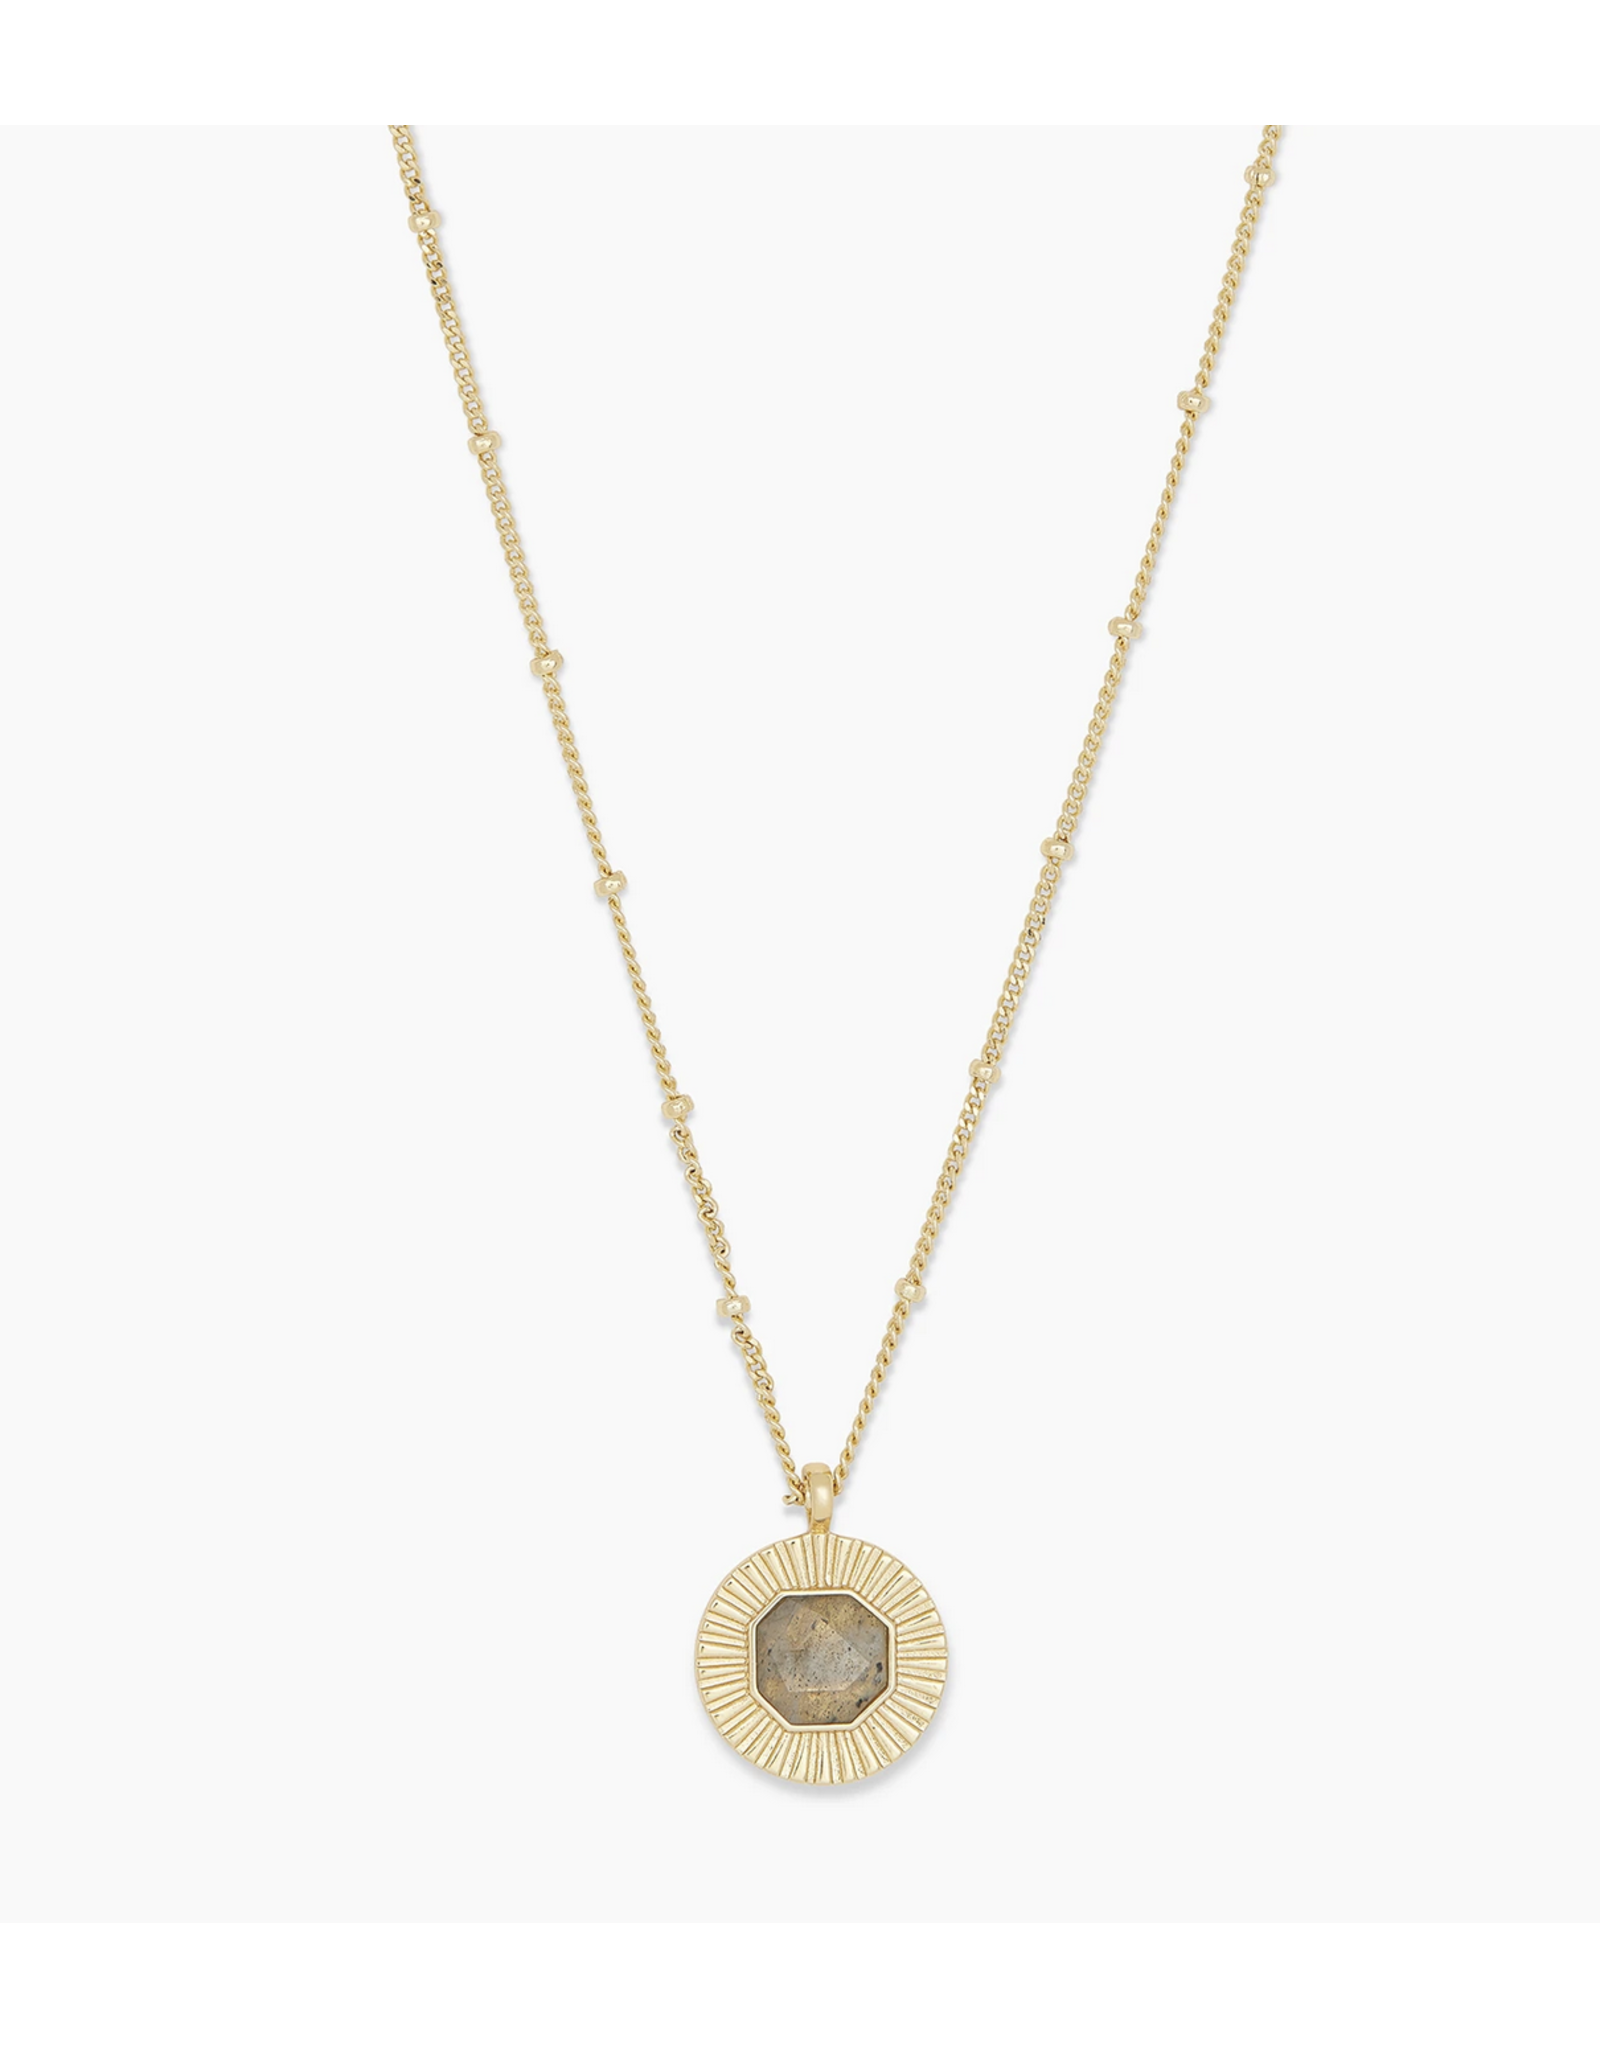 Gorjana Power Gemstone Coin Necklace for Balance